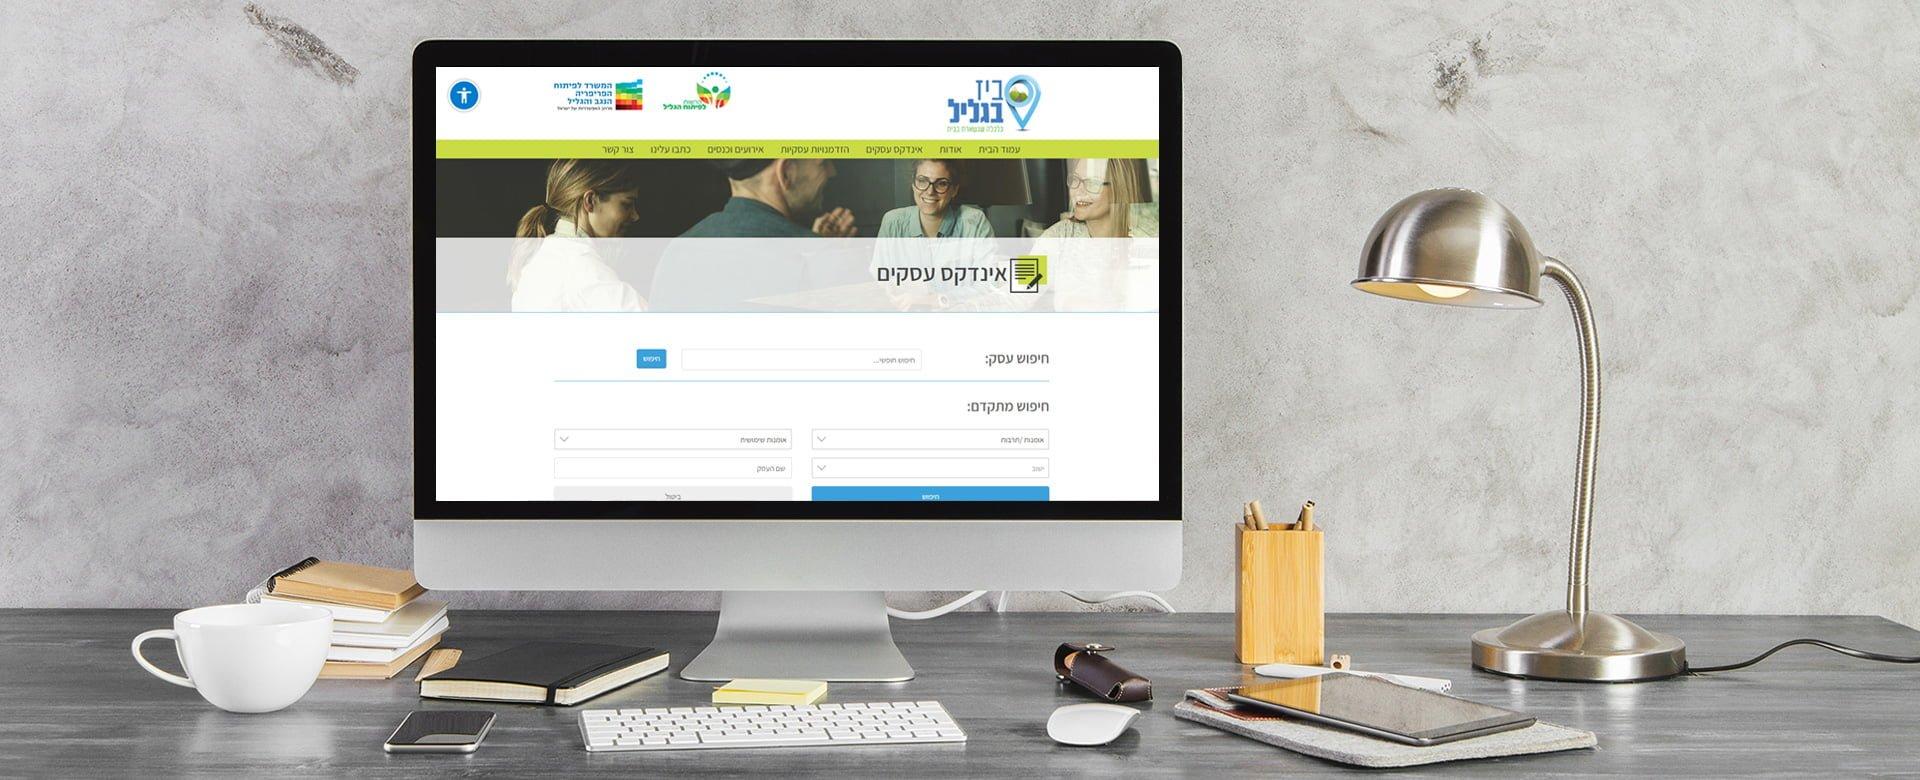 biz-baglil website